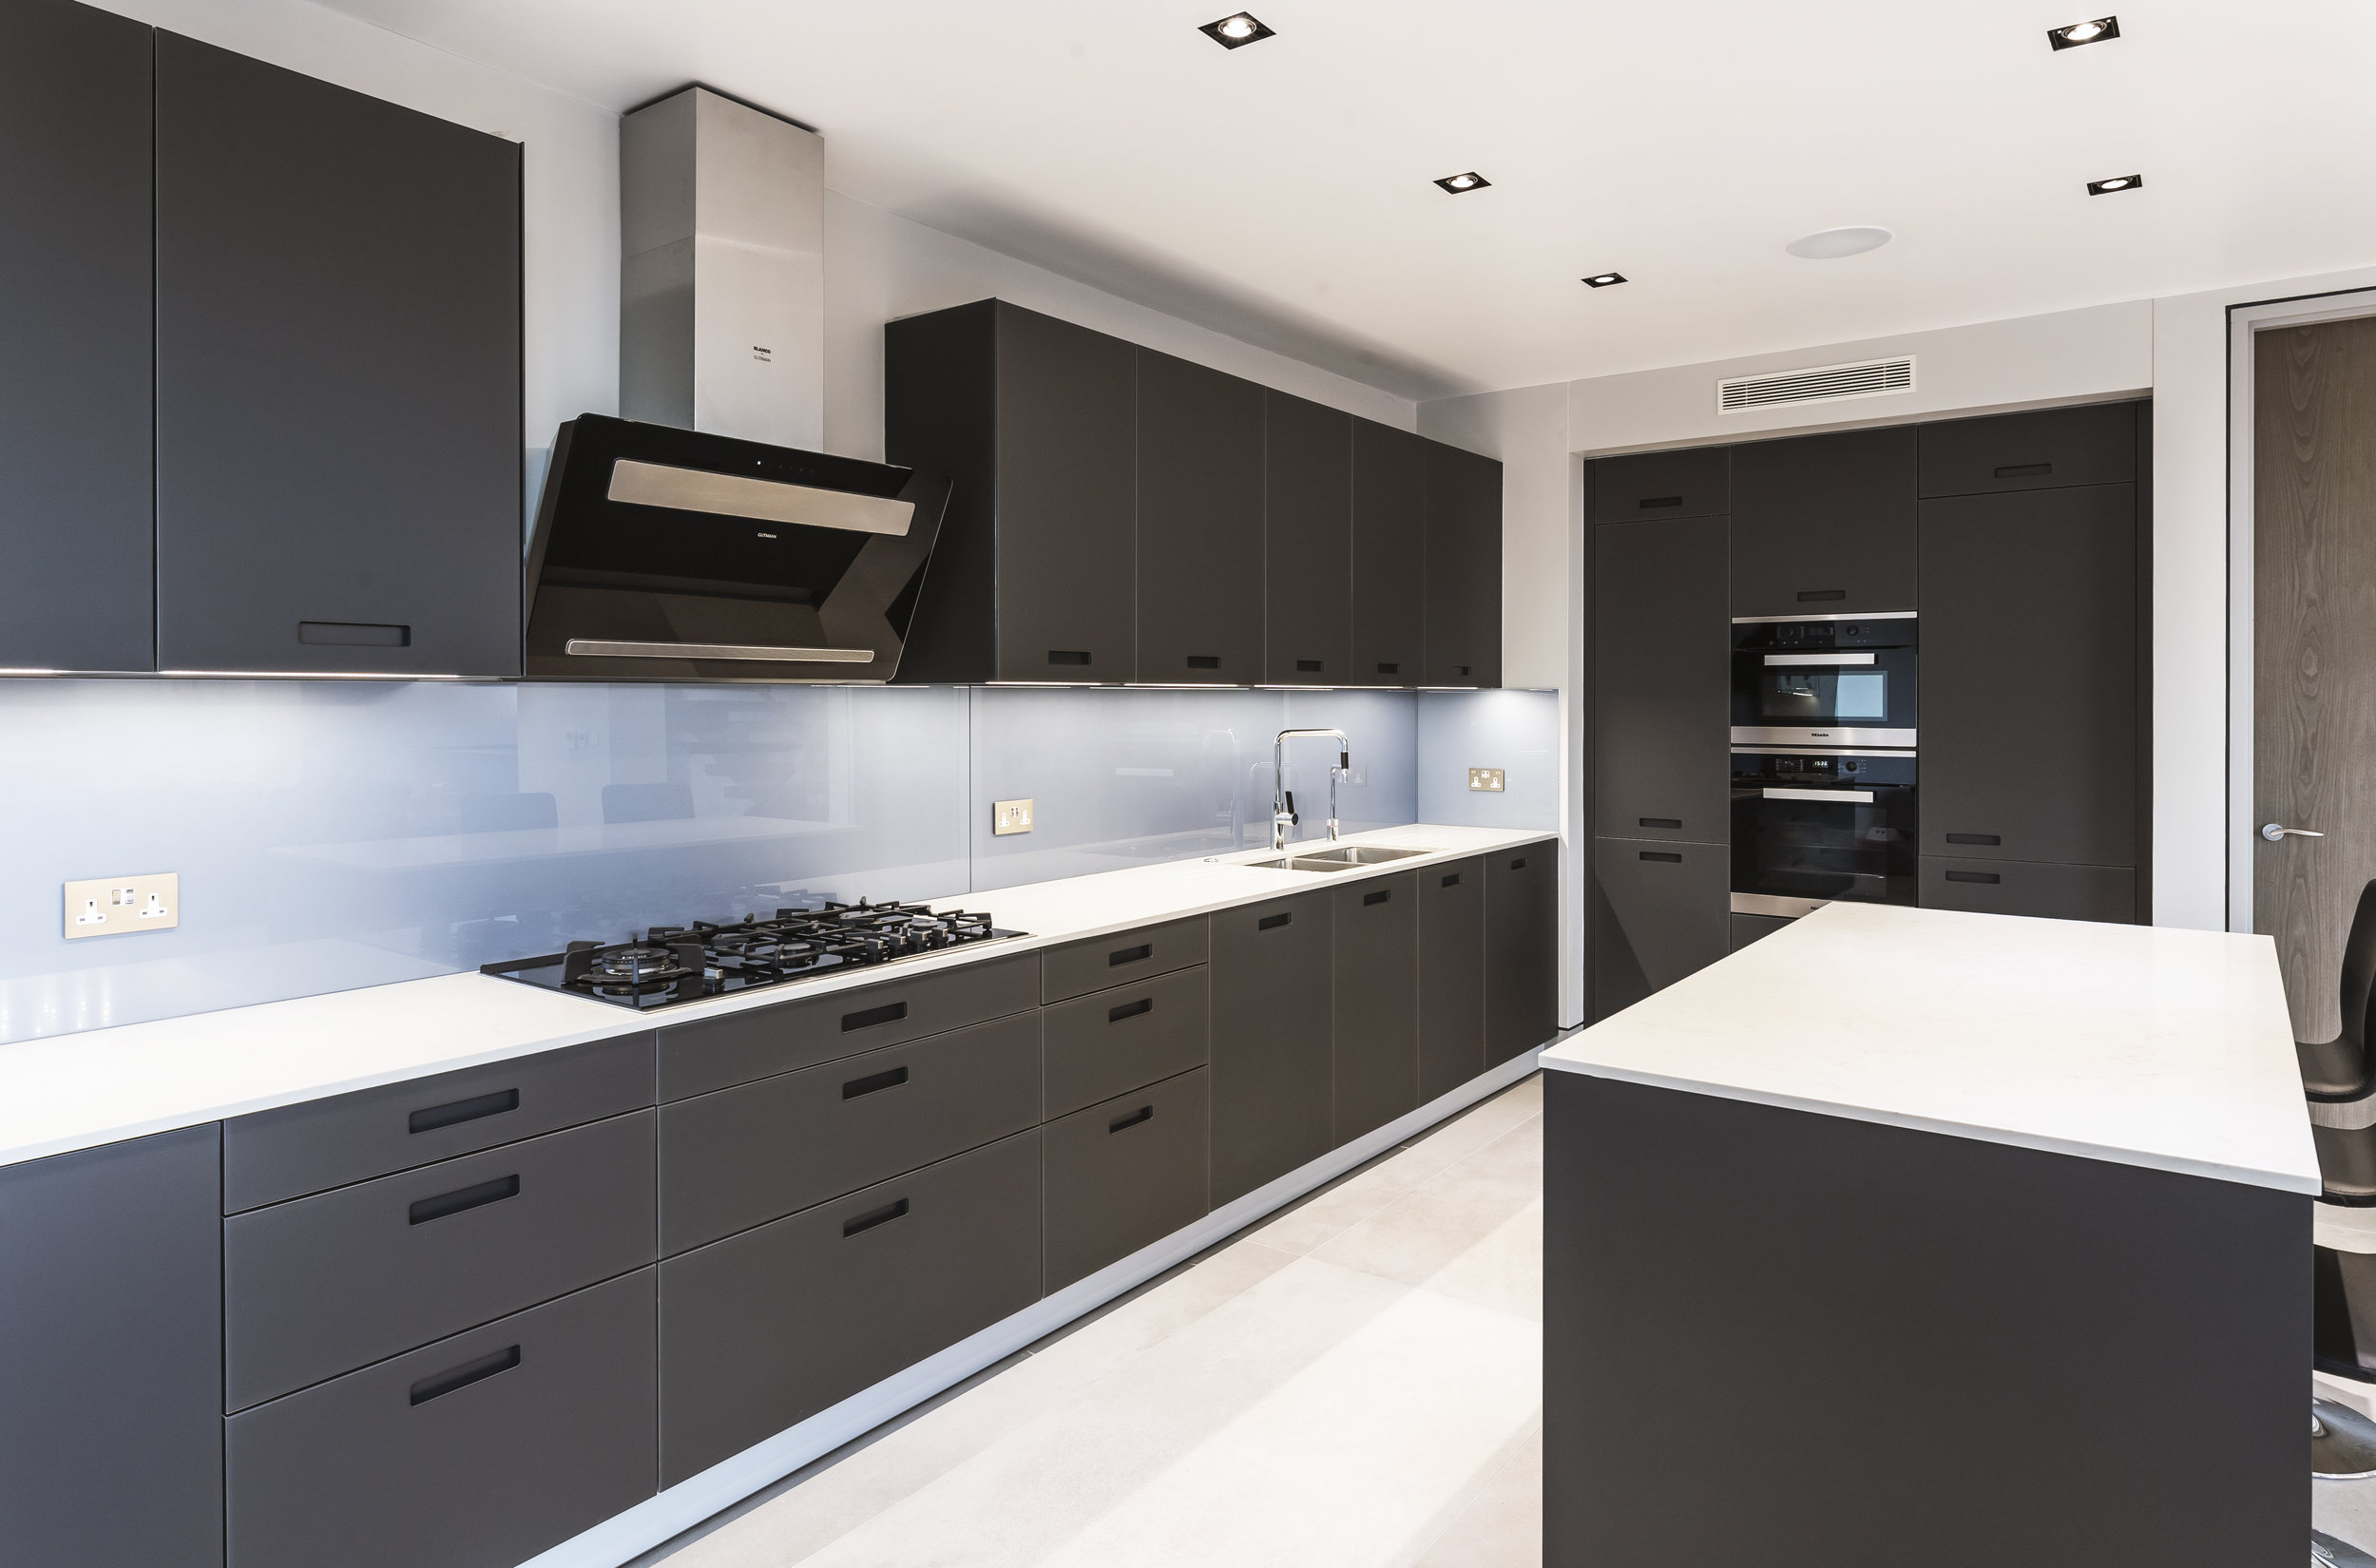 allum_reshoot_internal_kitchen_b.jpg